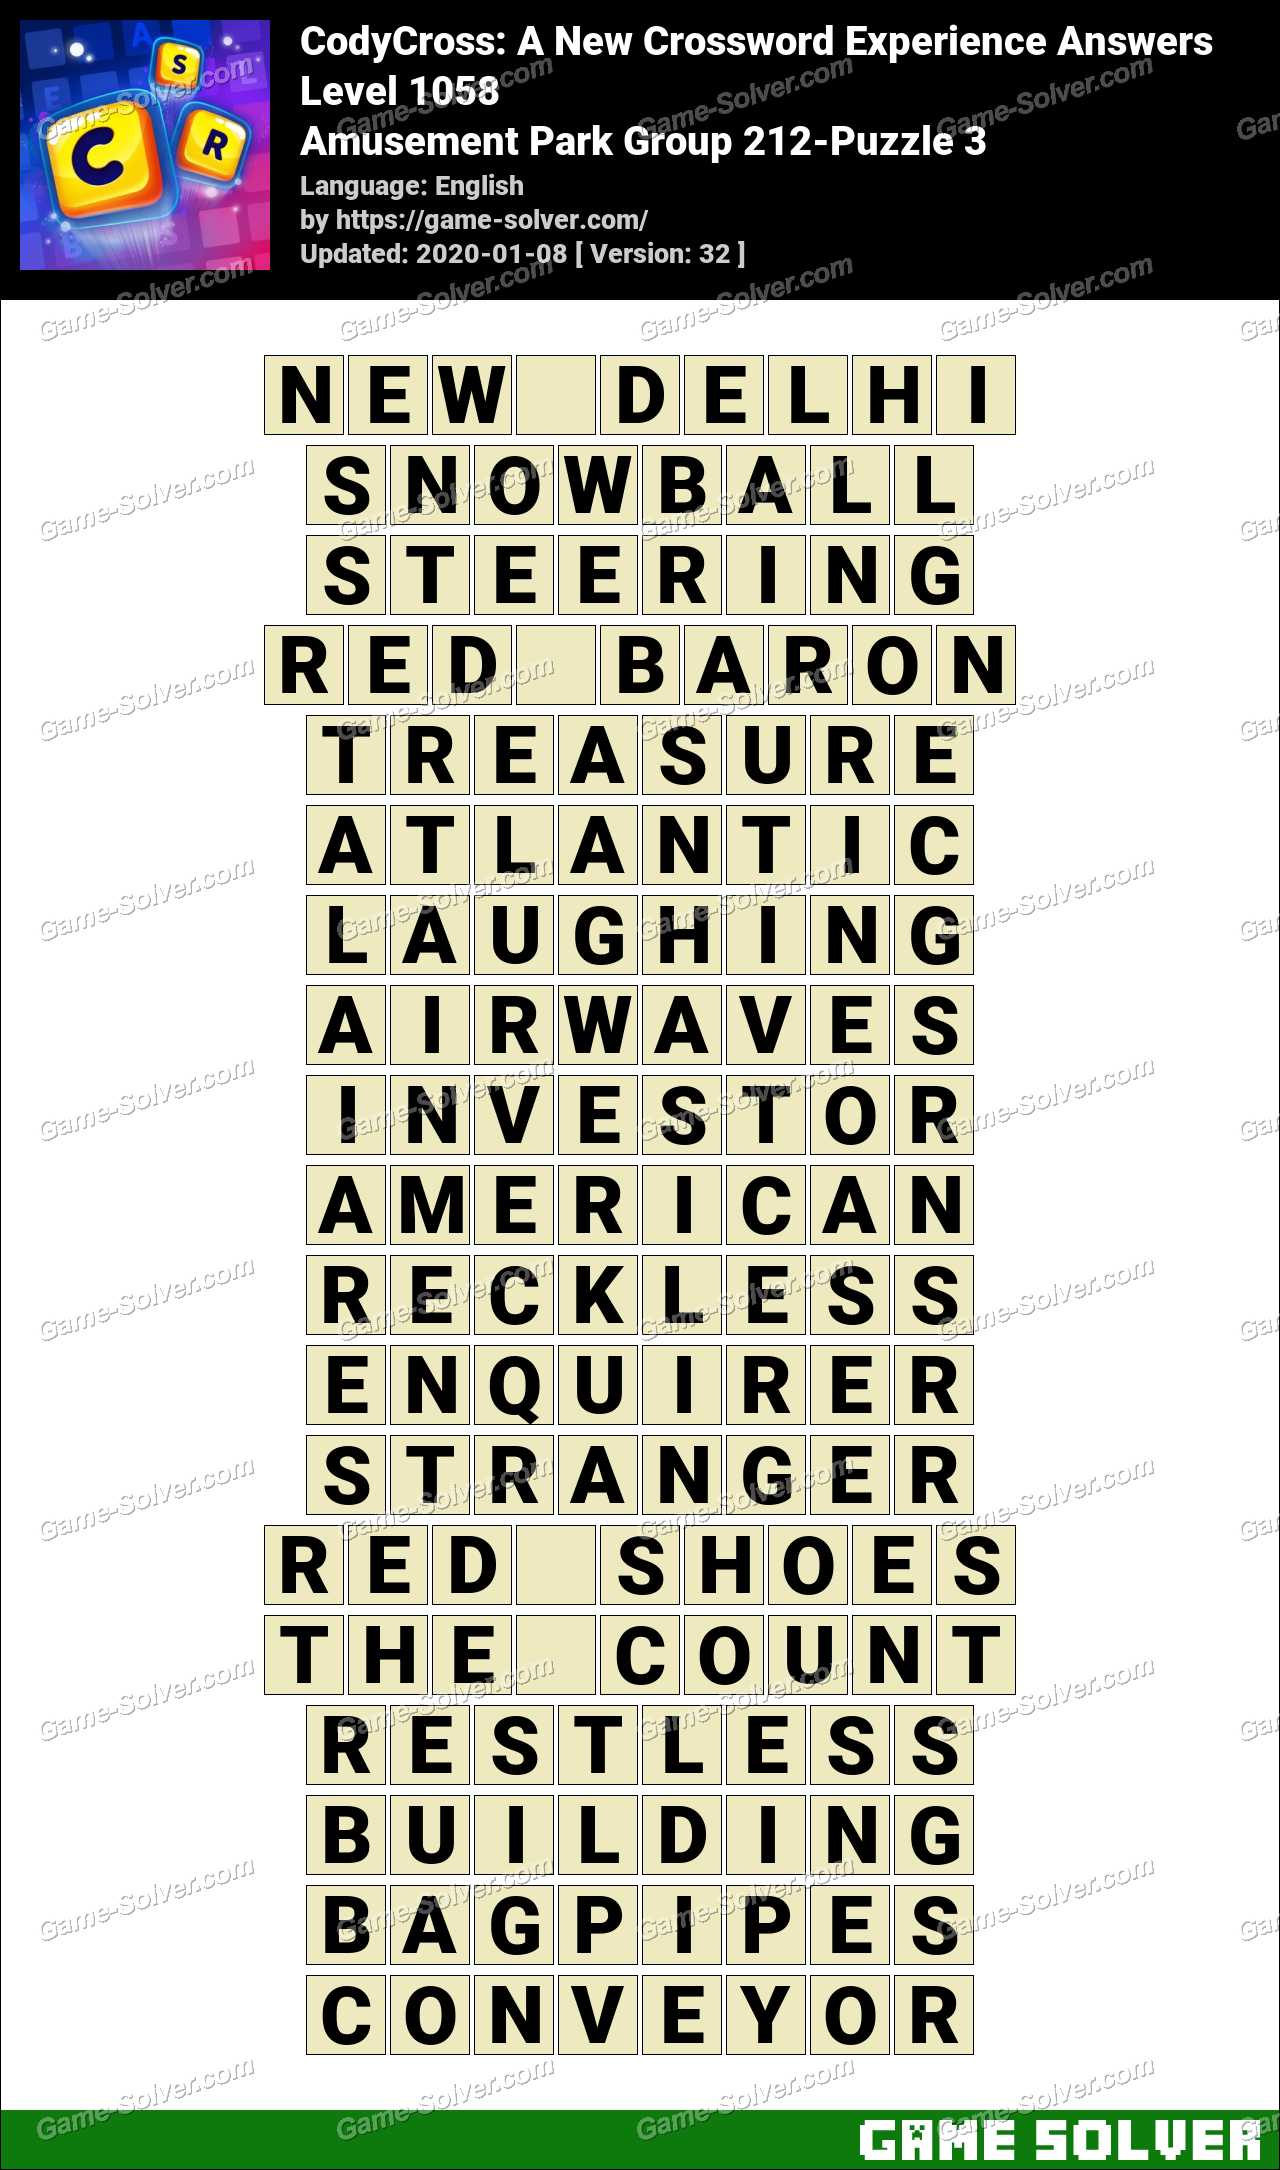 CodyCross Amusement Park Group 212-Puzzle 3 Answers